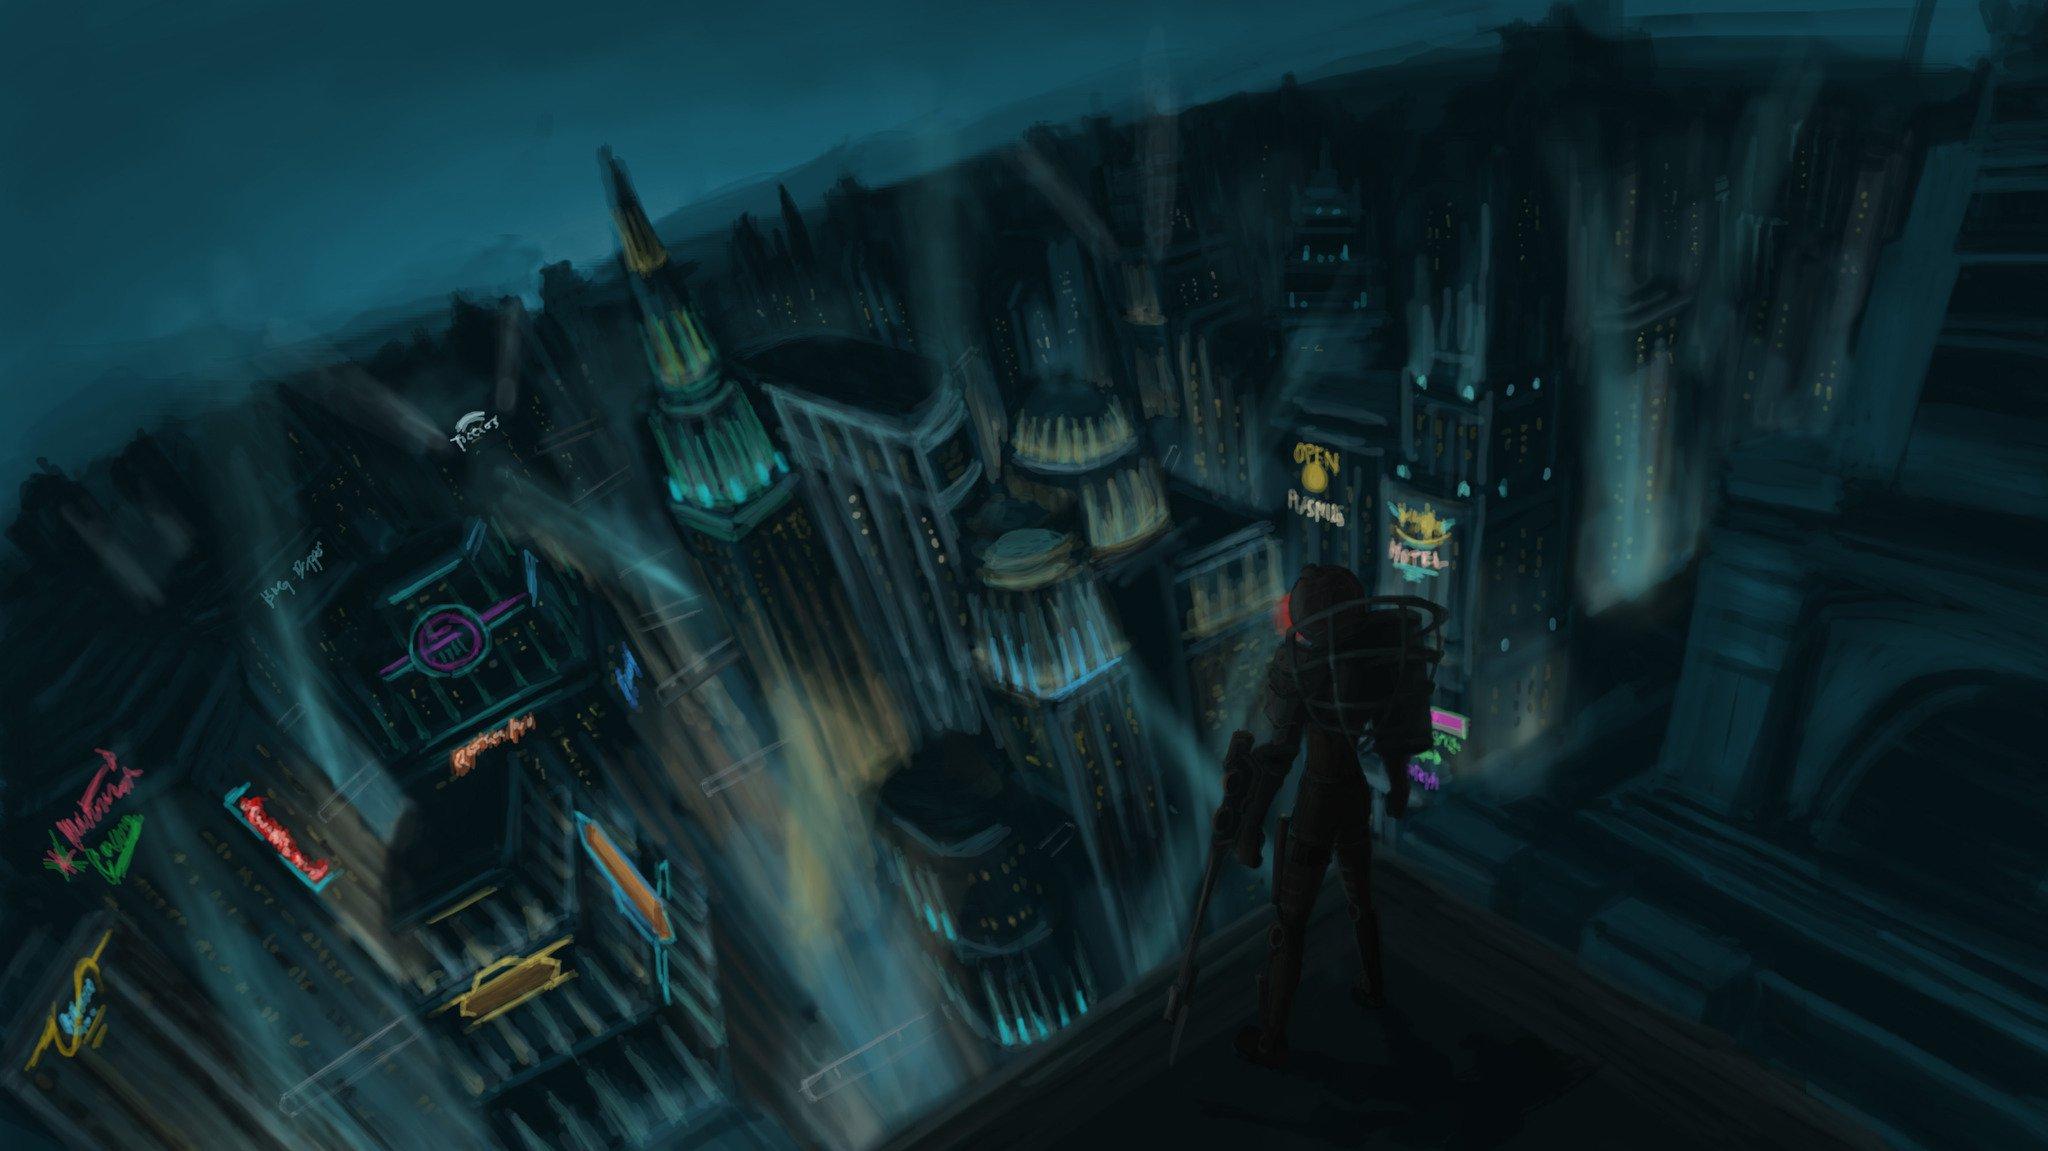 Bioshock 2 Gameplay On Rapture Wallpaper Car Pictures 2048x1151